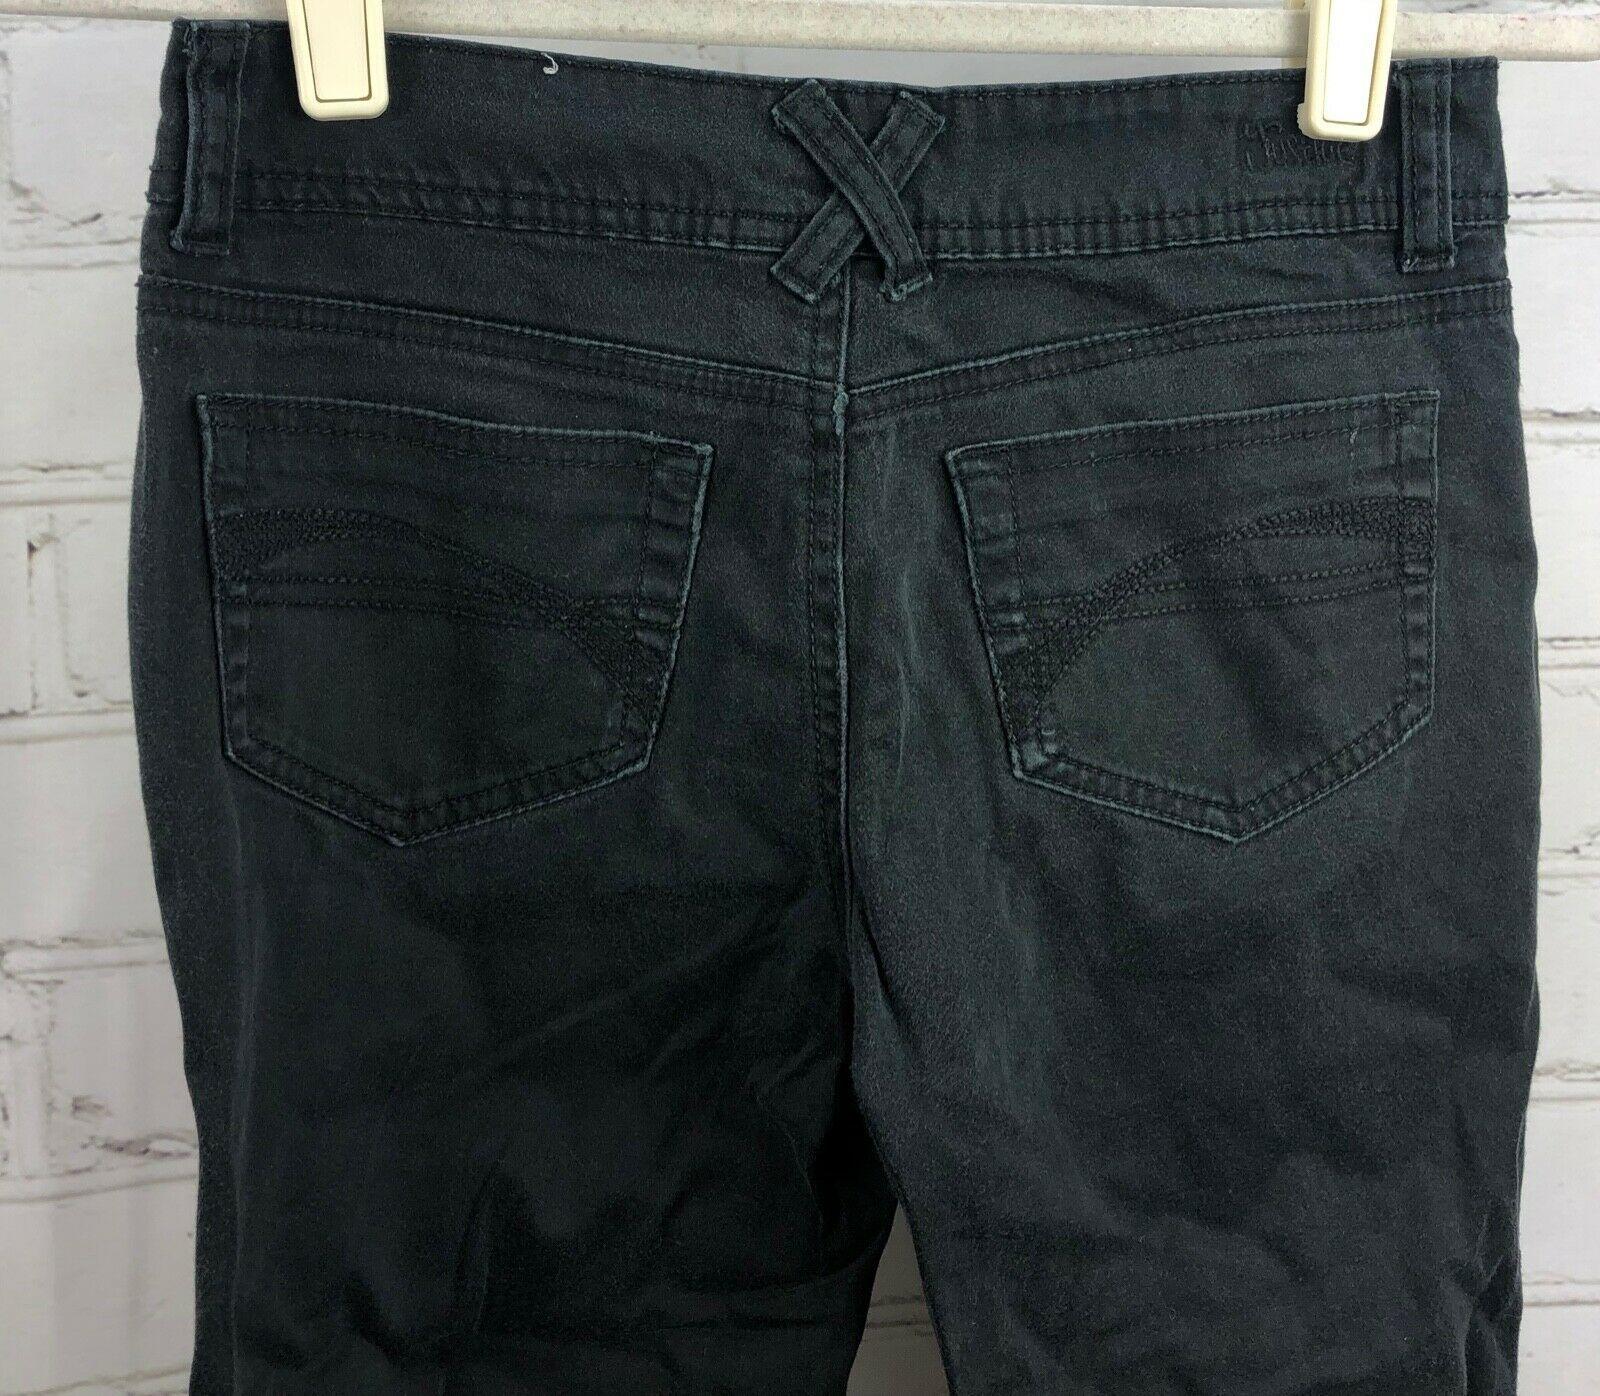 JUSTICE Beaded Stripe Top + Black Capri Pants Girls Size 12 Outfit Set image 7